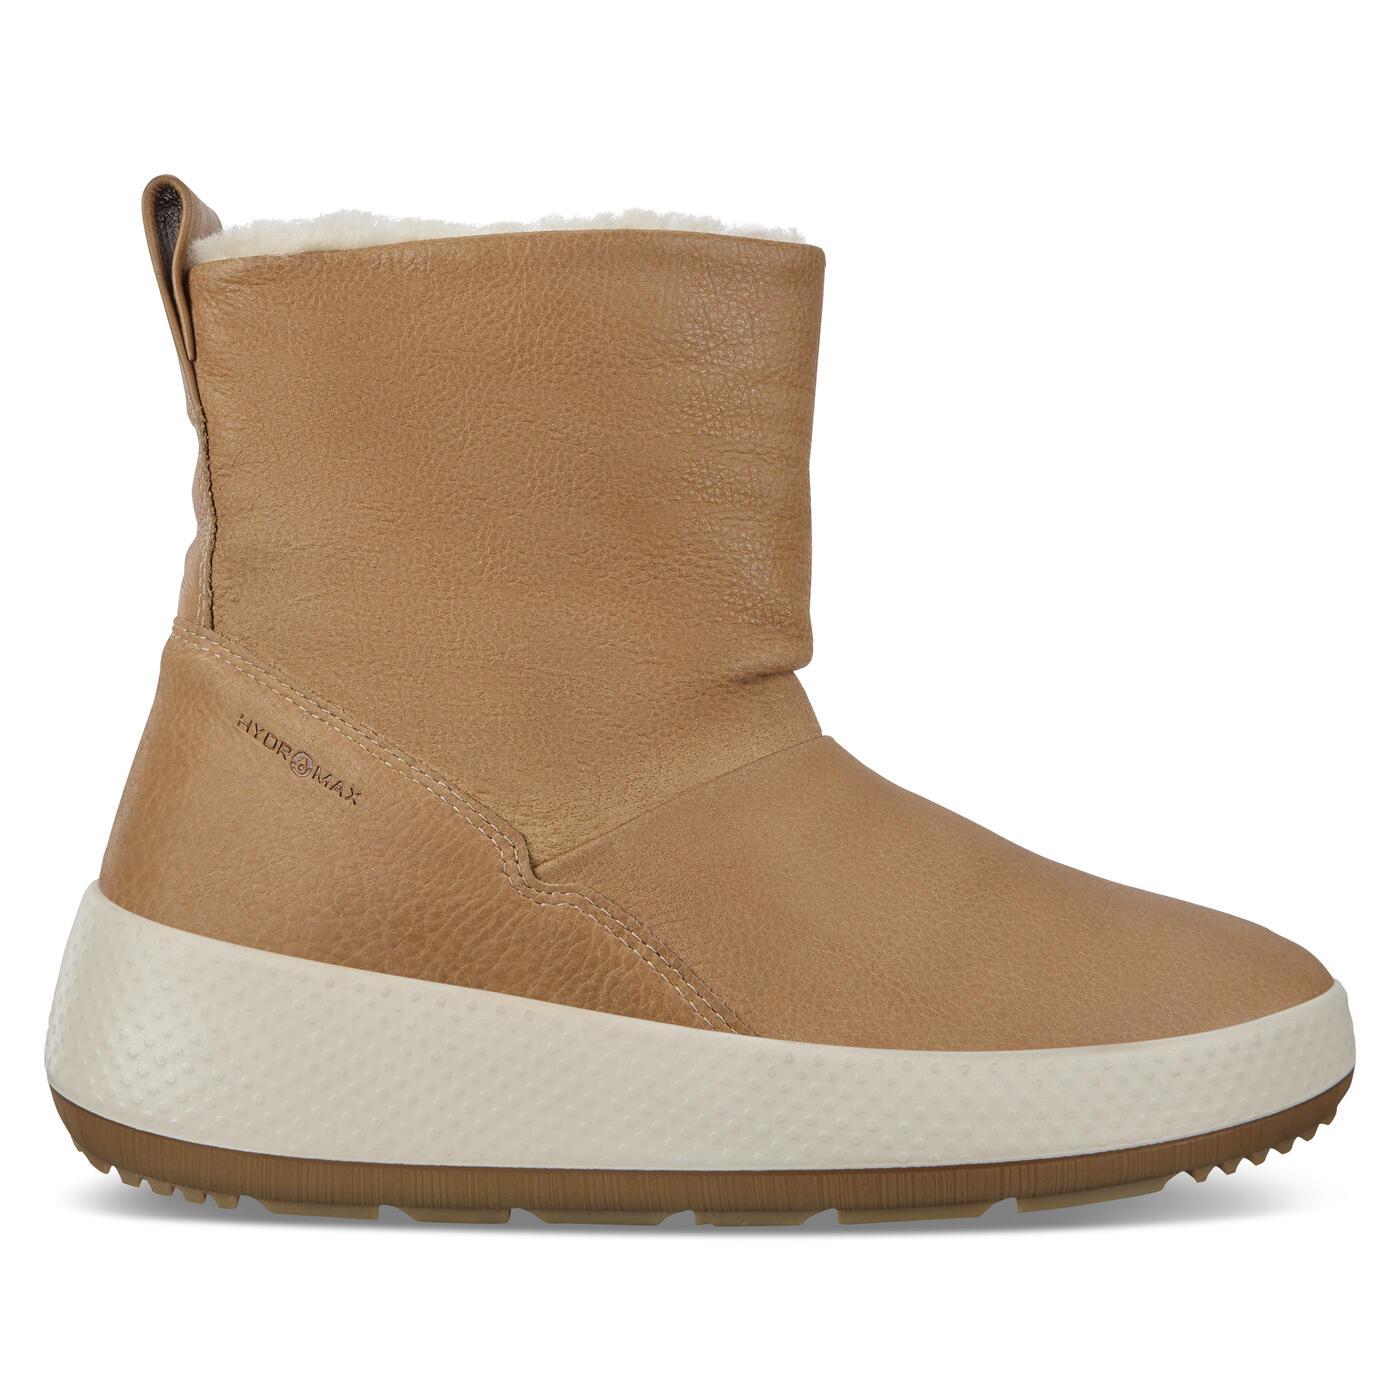 ECCO Ukiuk 2.0 Womens Boot